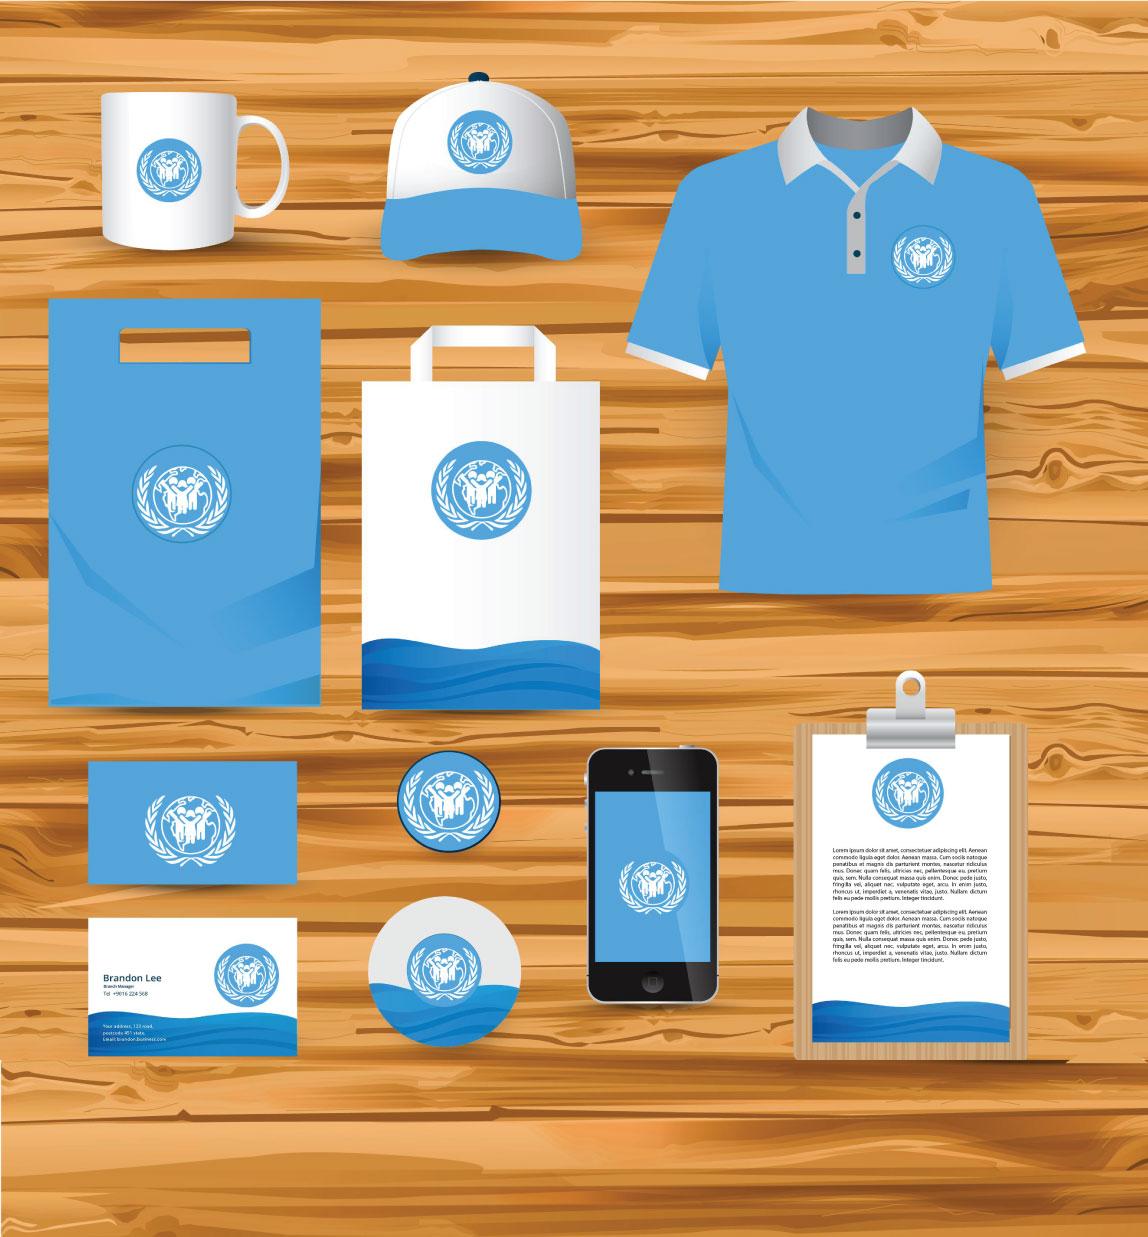 I will design versatile minimalist 3d business logo